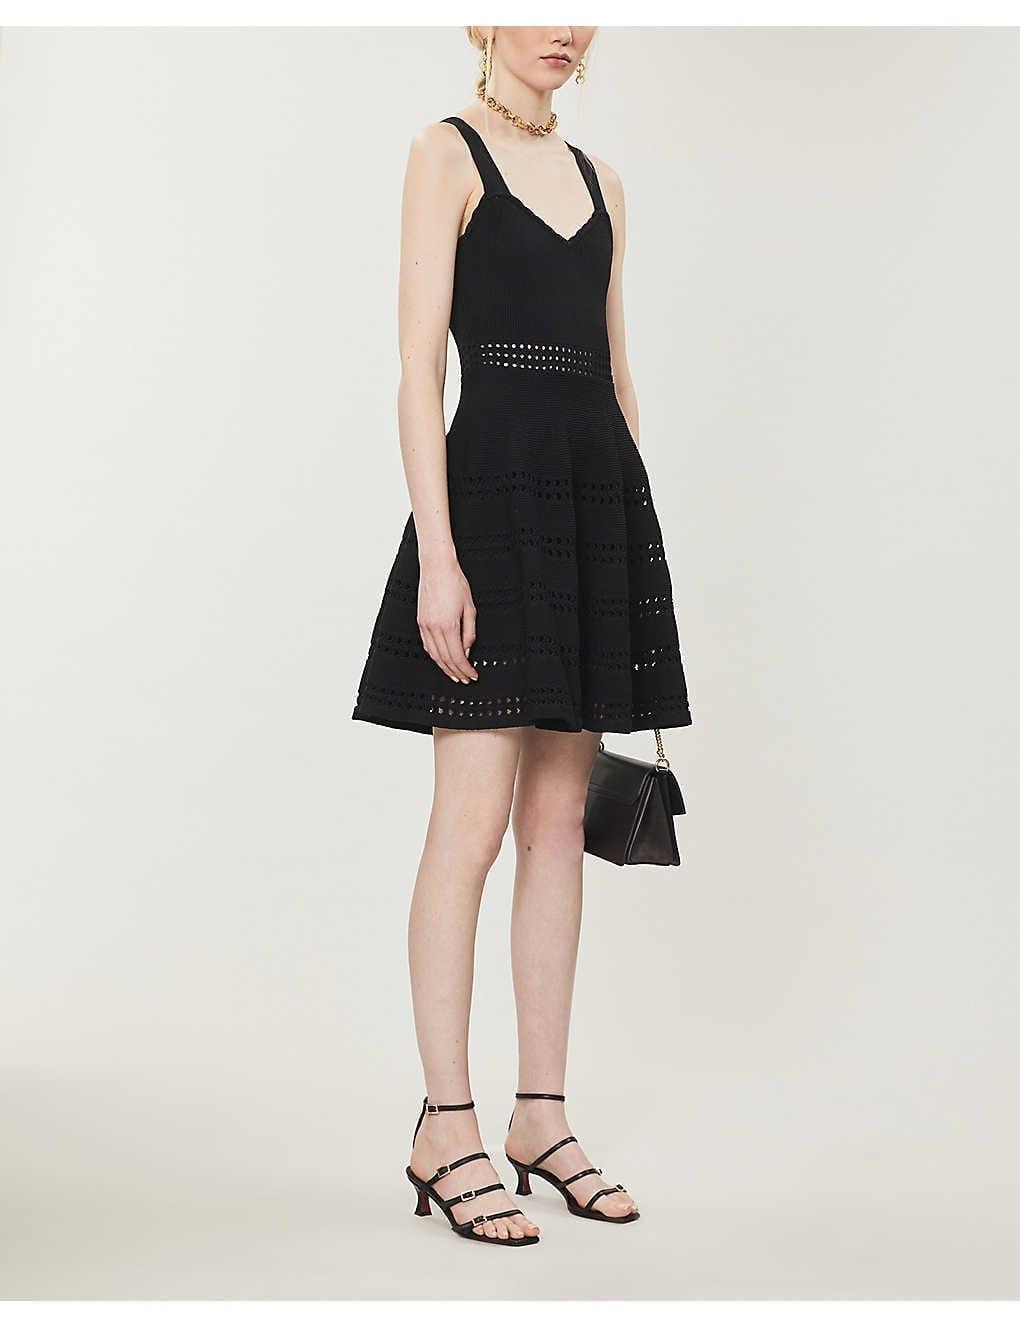 MAJE Cut-out Detail Stretch-knit Midi Dress